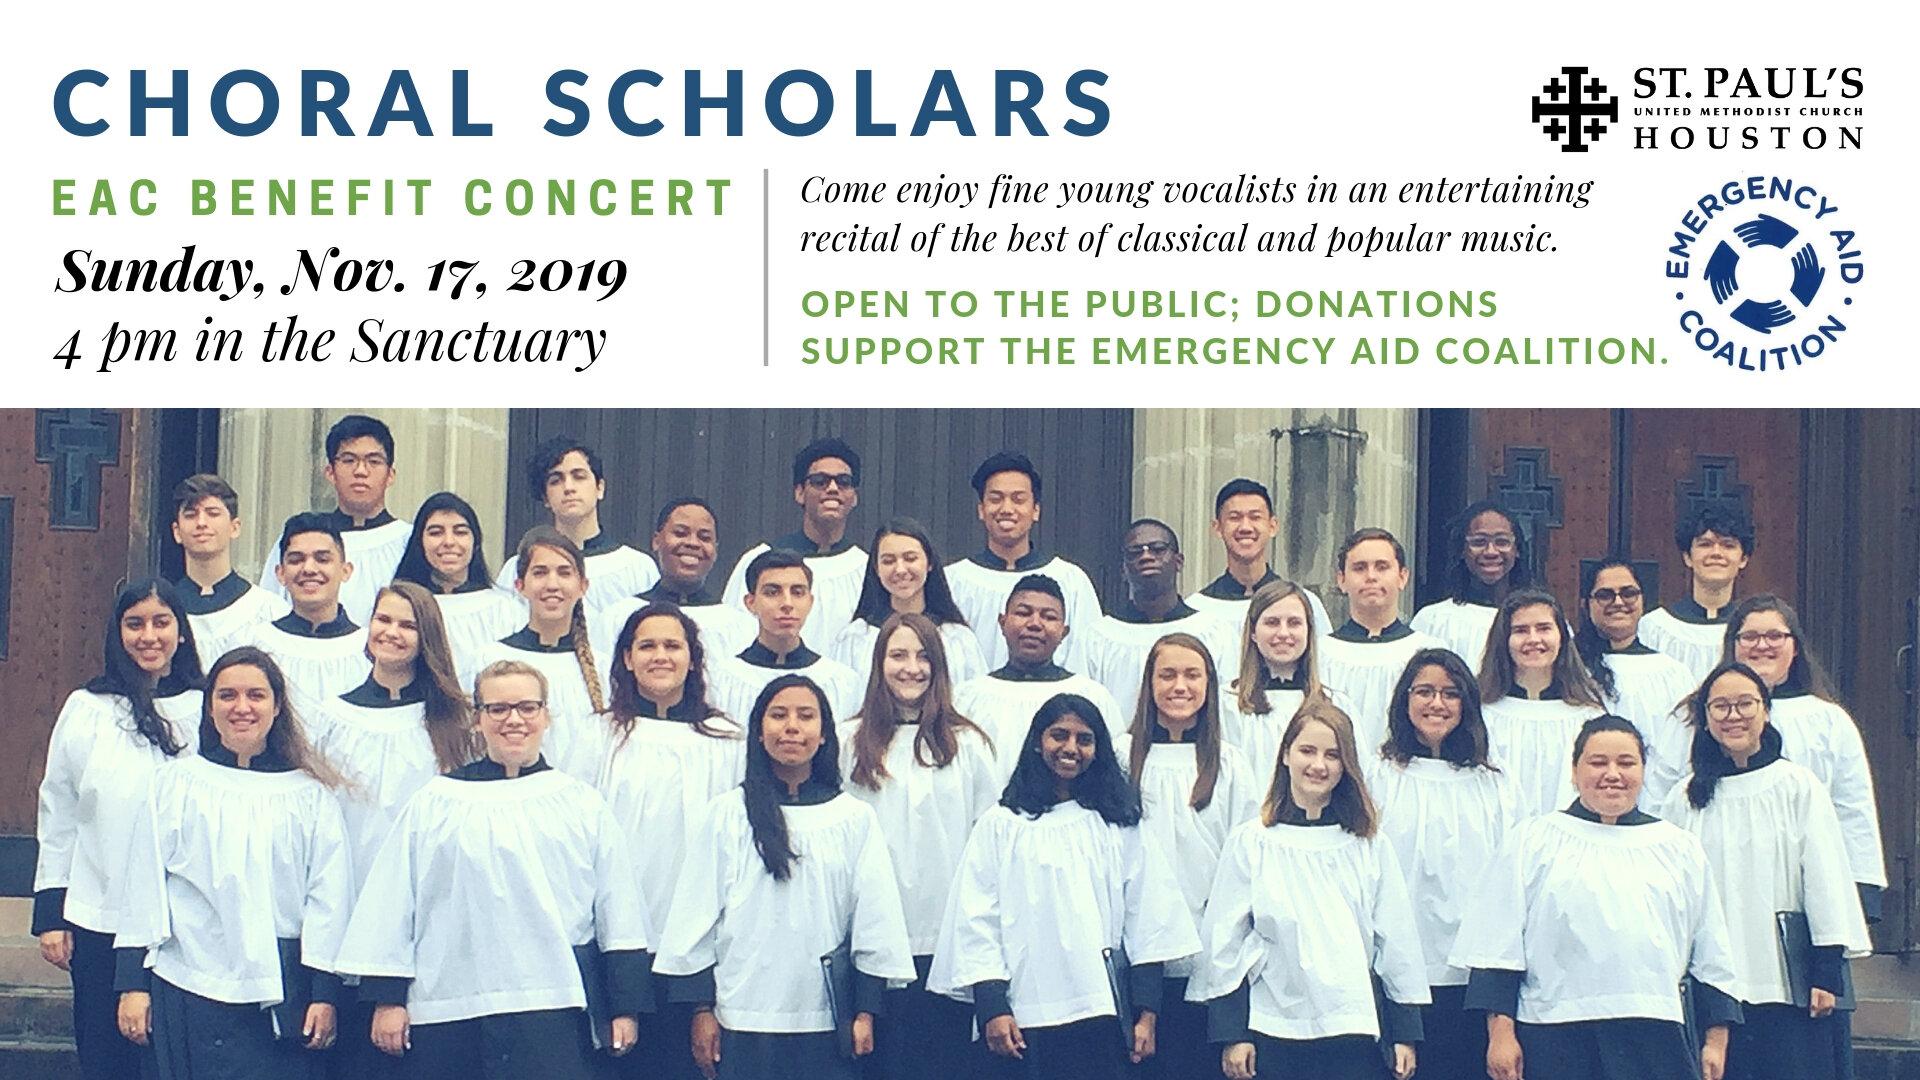 16x9 Choral Scholars EAC Benefit Concert - 2019.jpg